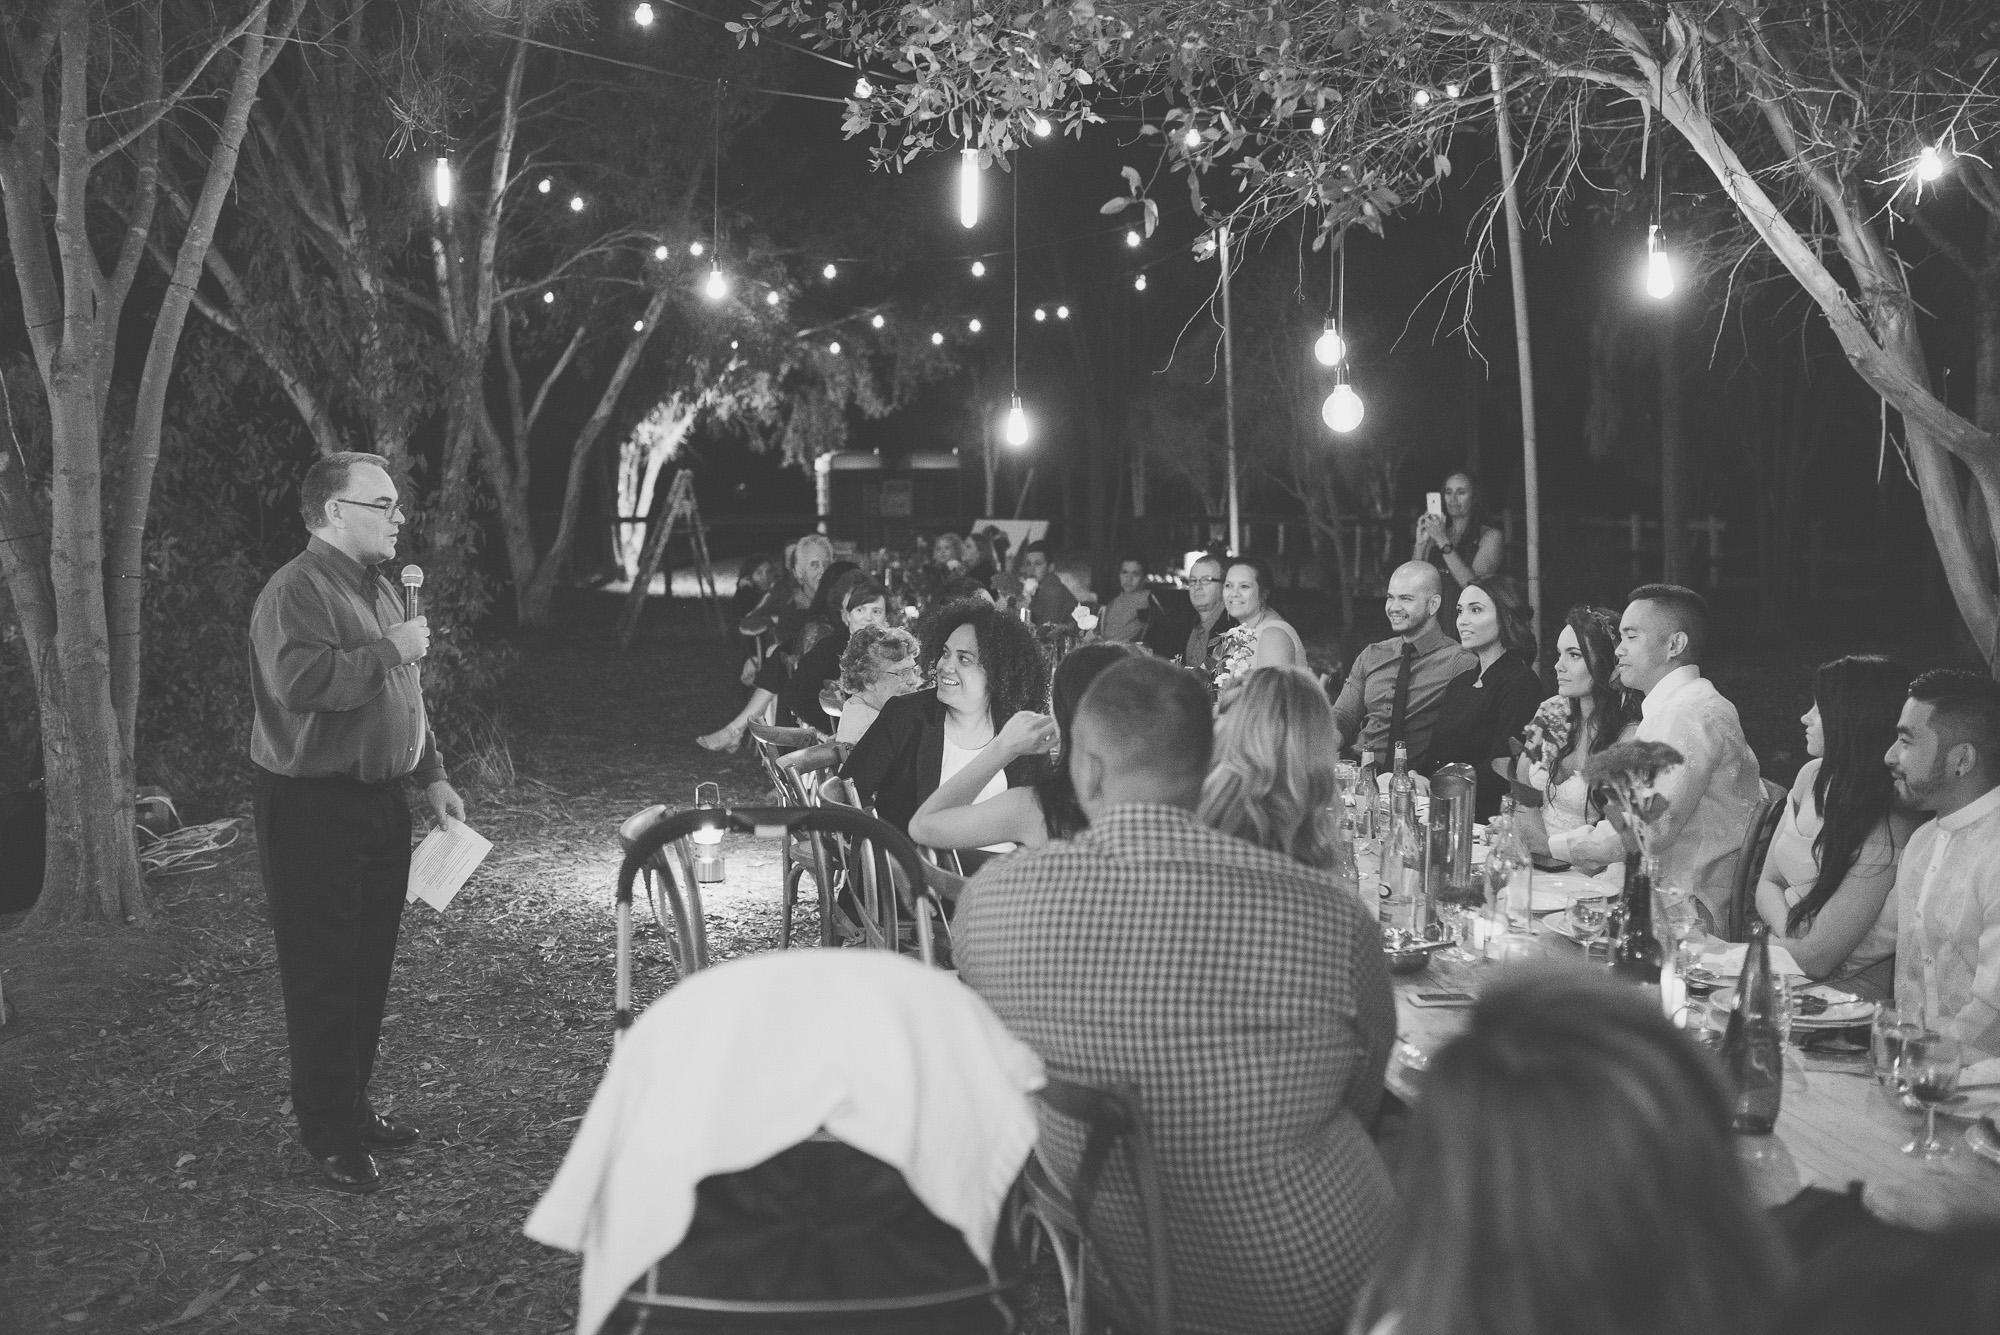 wedding-photographer-outdoor-casual-styled-los-angeles-australia-california-international-earthbound -92.jpg